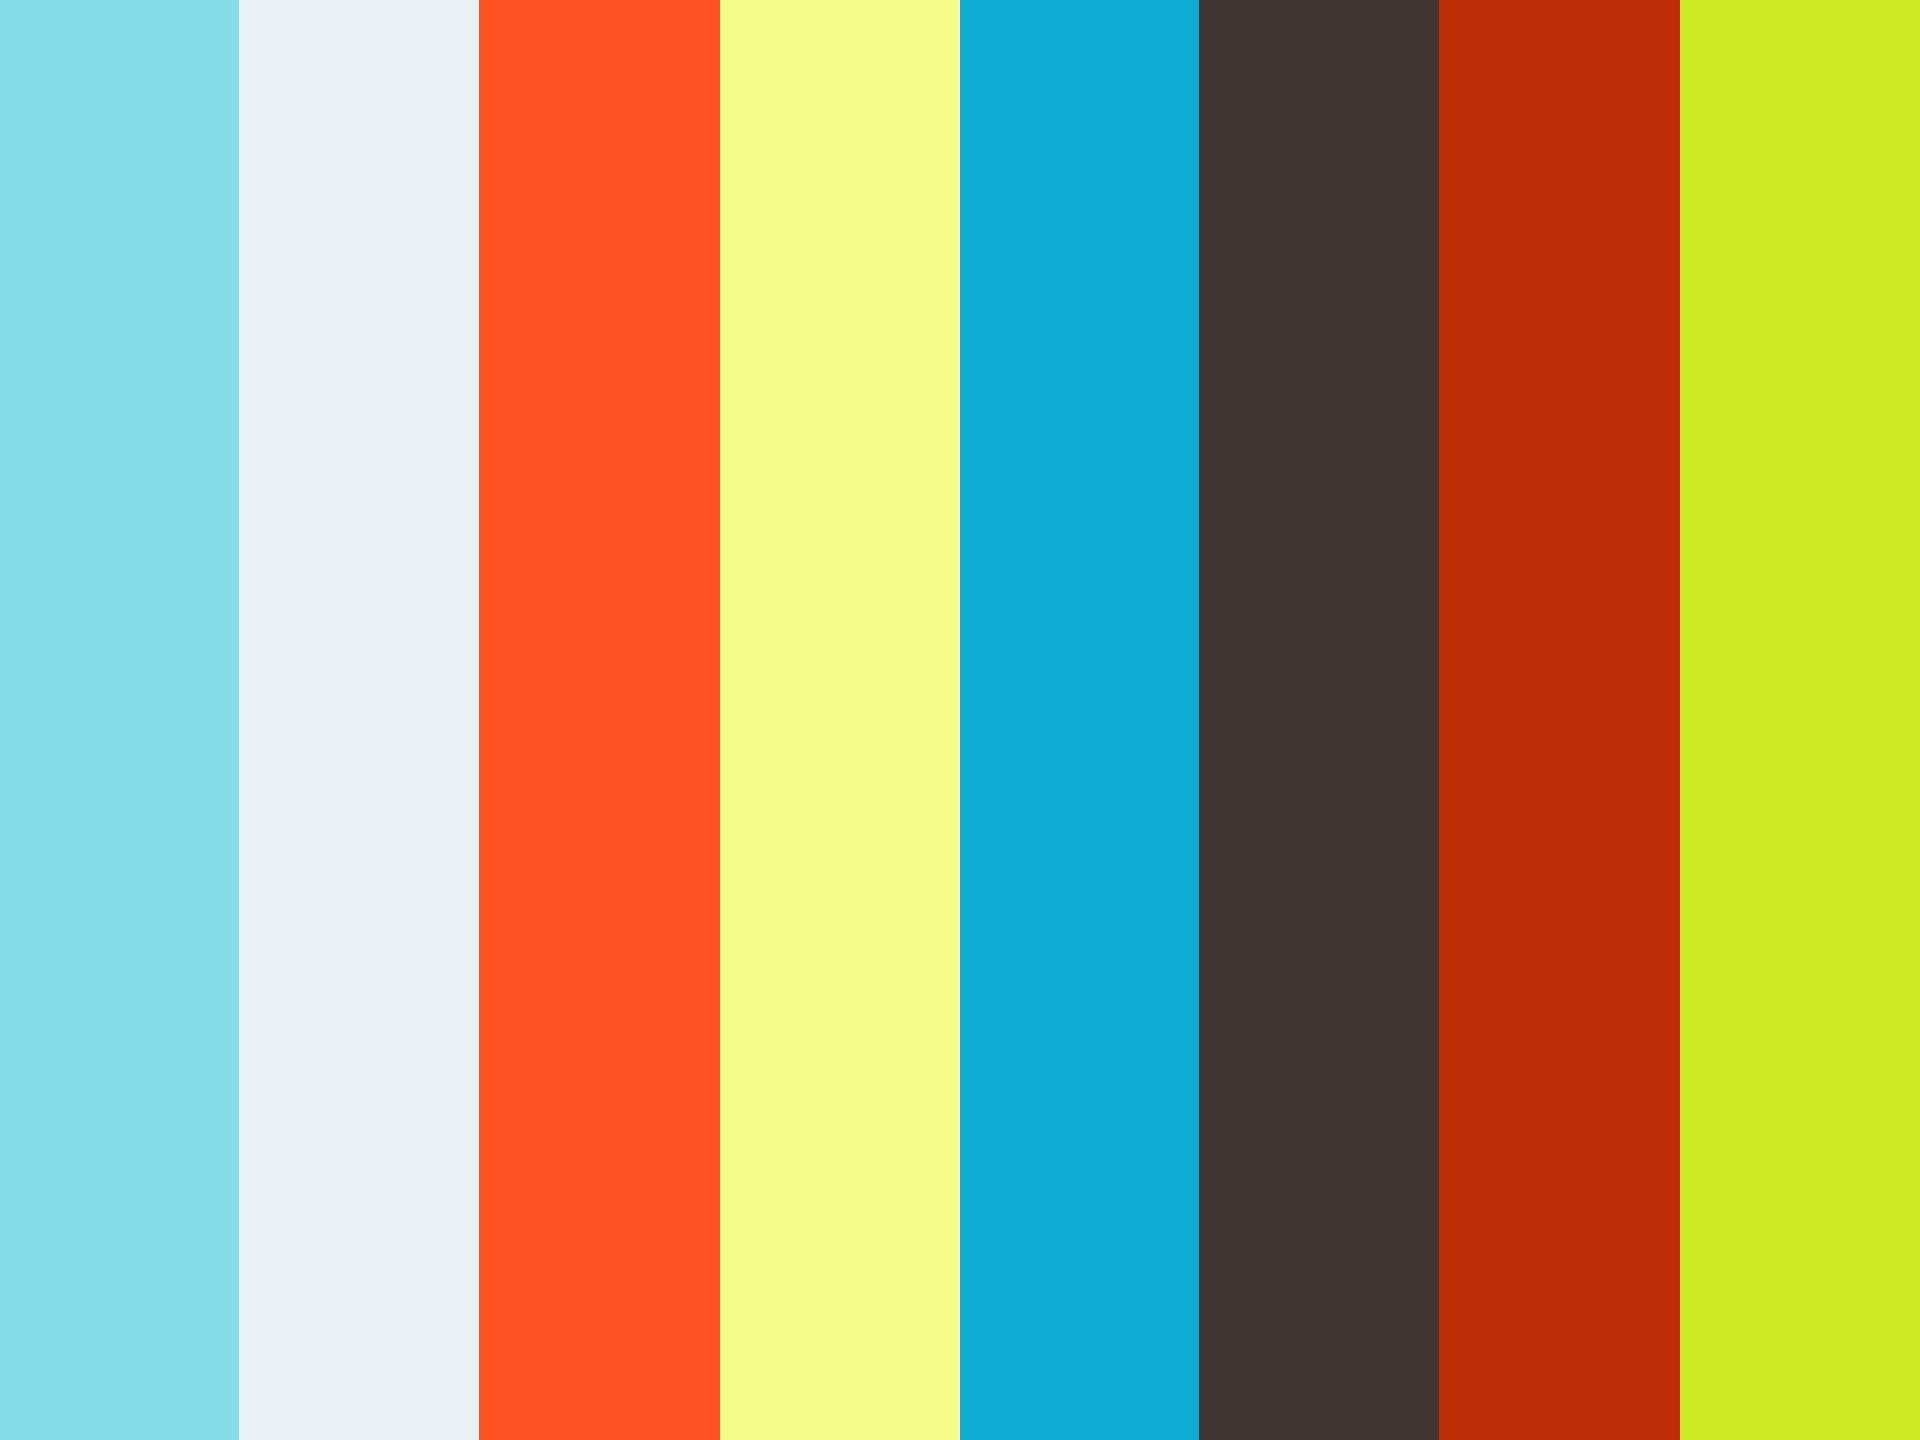 Serif TV for Samsung, Ronan & Erwan Bouroullec, 2015